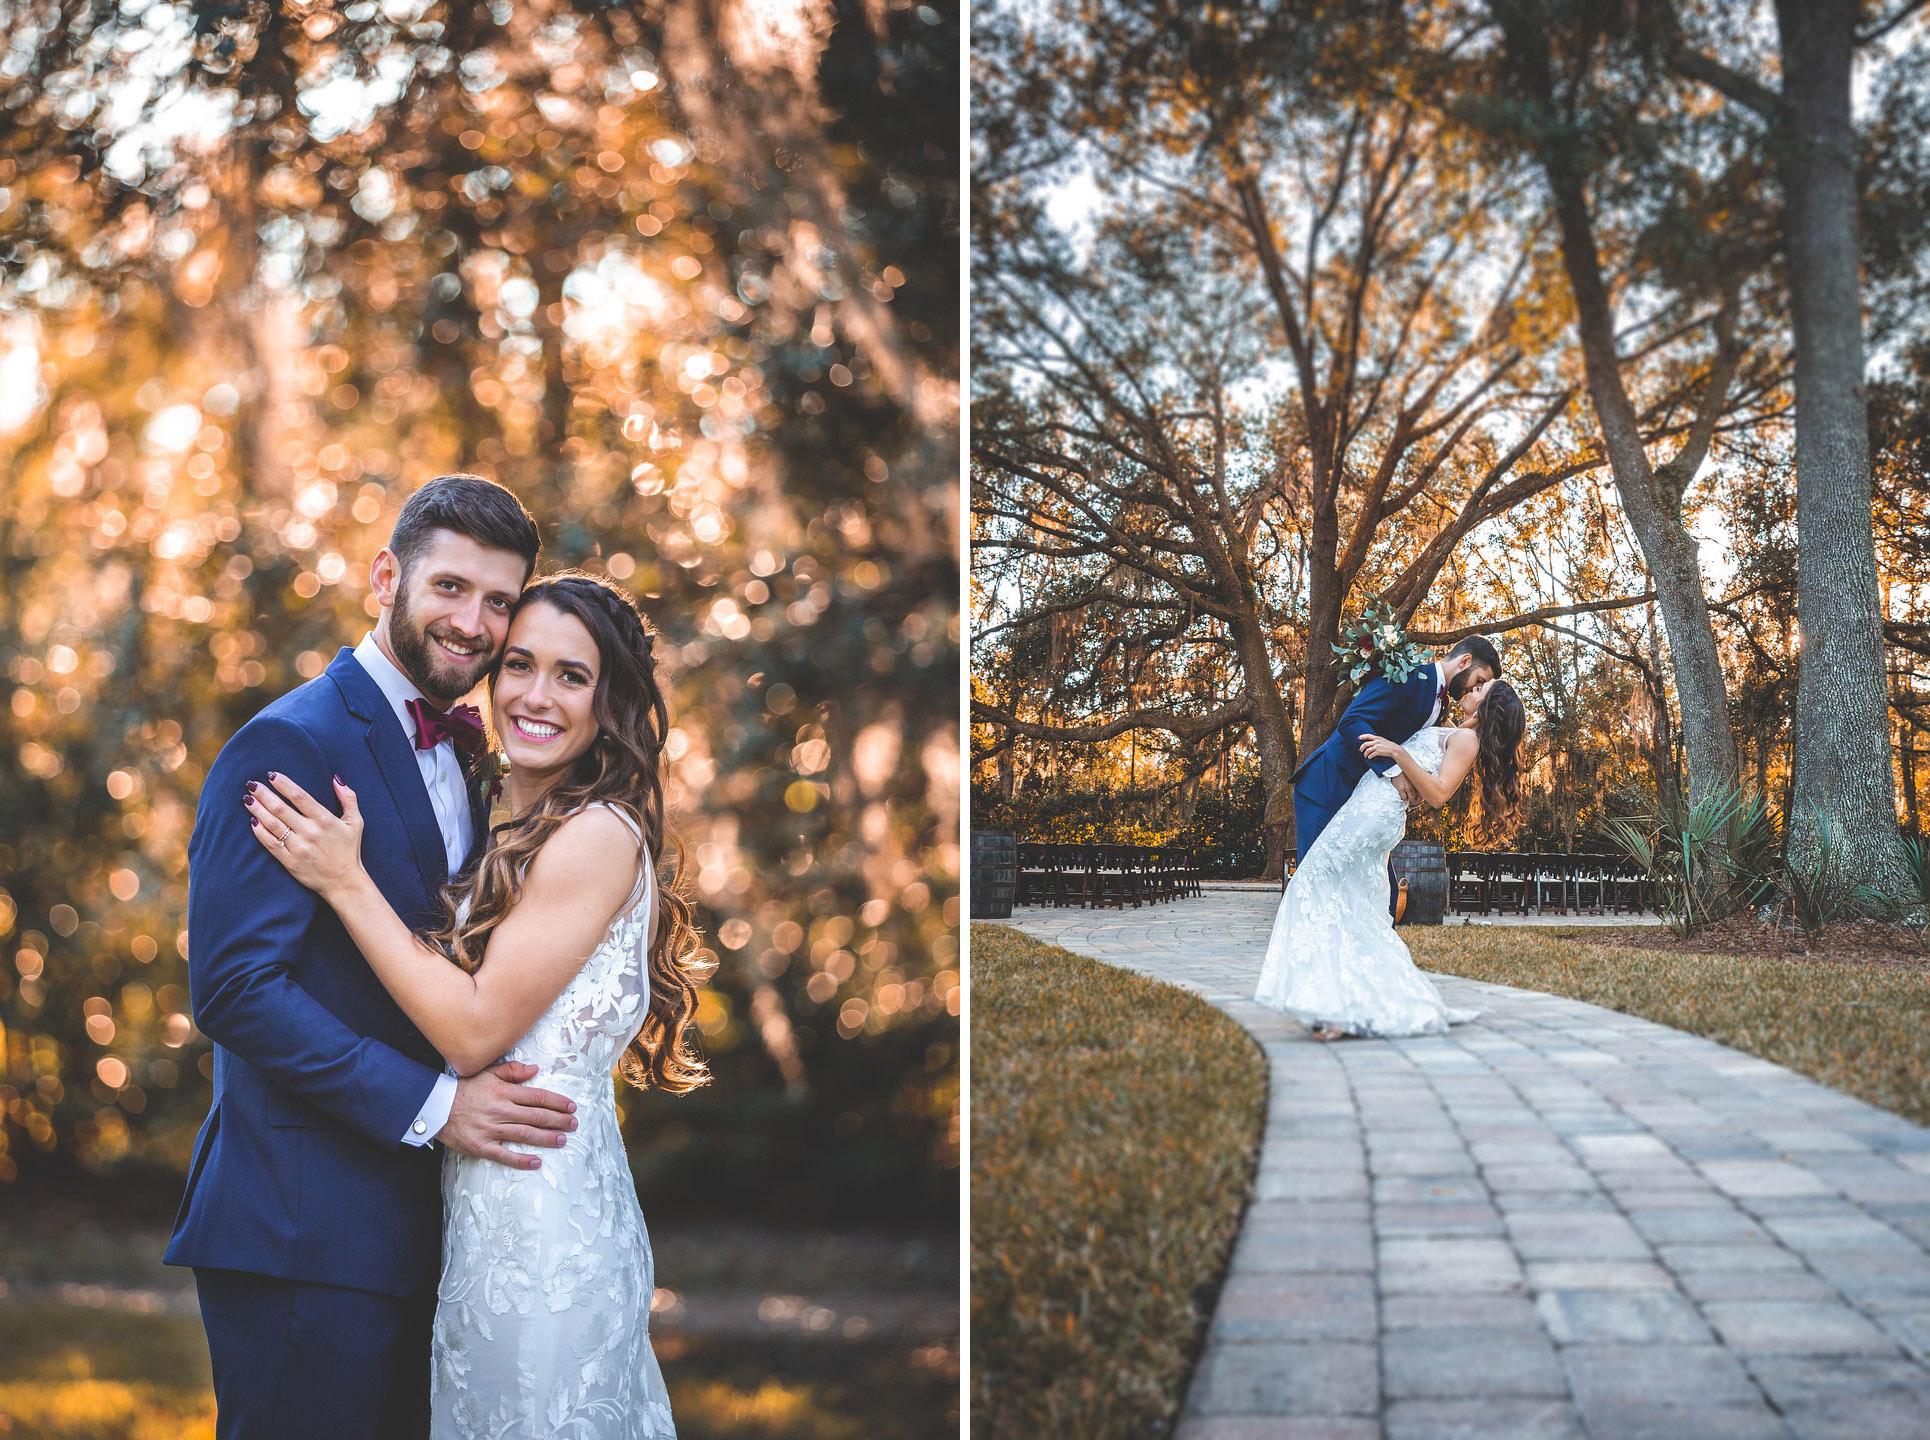 adam-szarmack-bowing-oaks-wedding-photographer-jacksonville-10.jpg